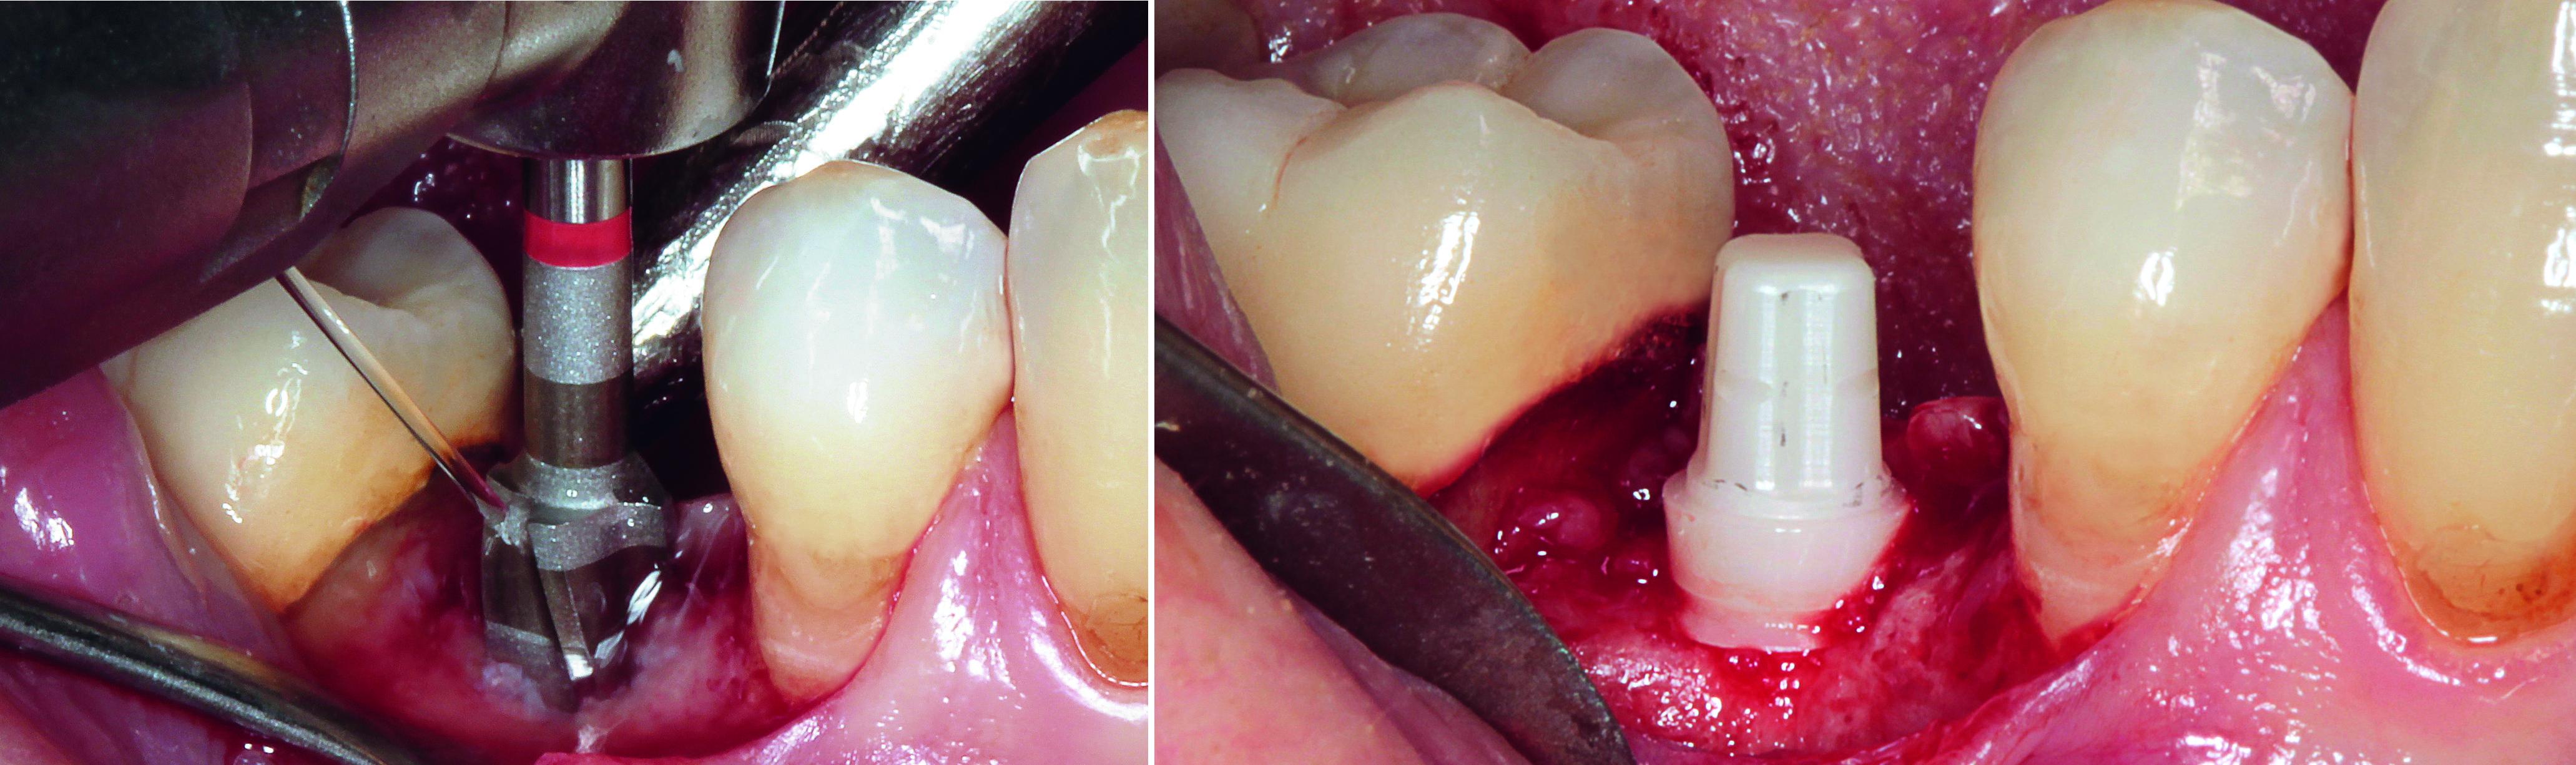 Abb. 3 Aufbereitung des Implantatbetts. Abb. 4 Das inserierte Keramikimplantat vor dem Nahtverschluss.